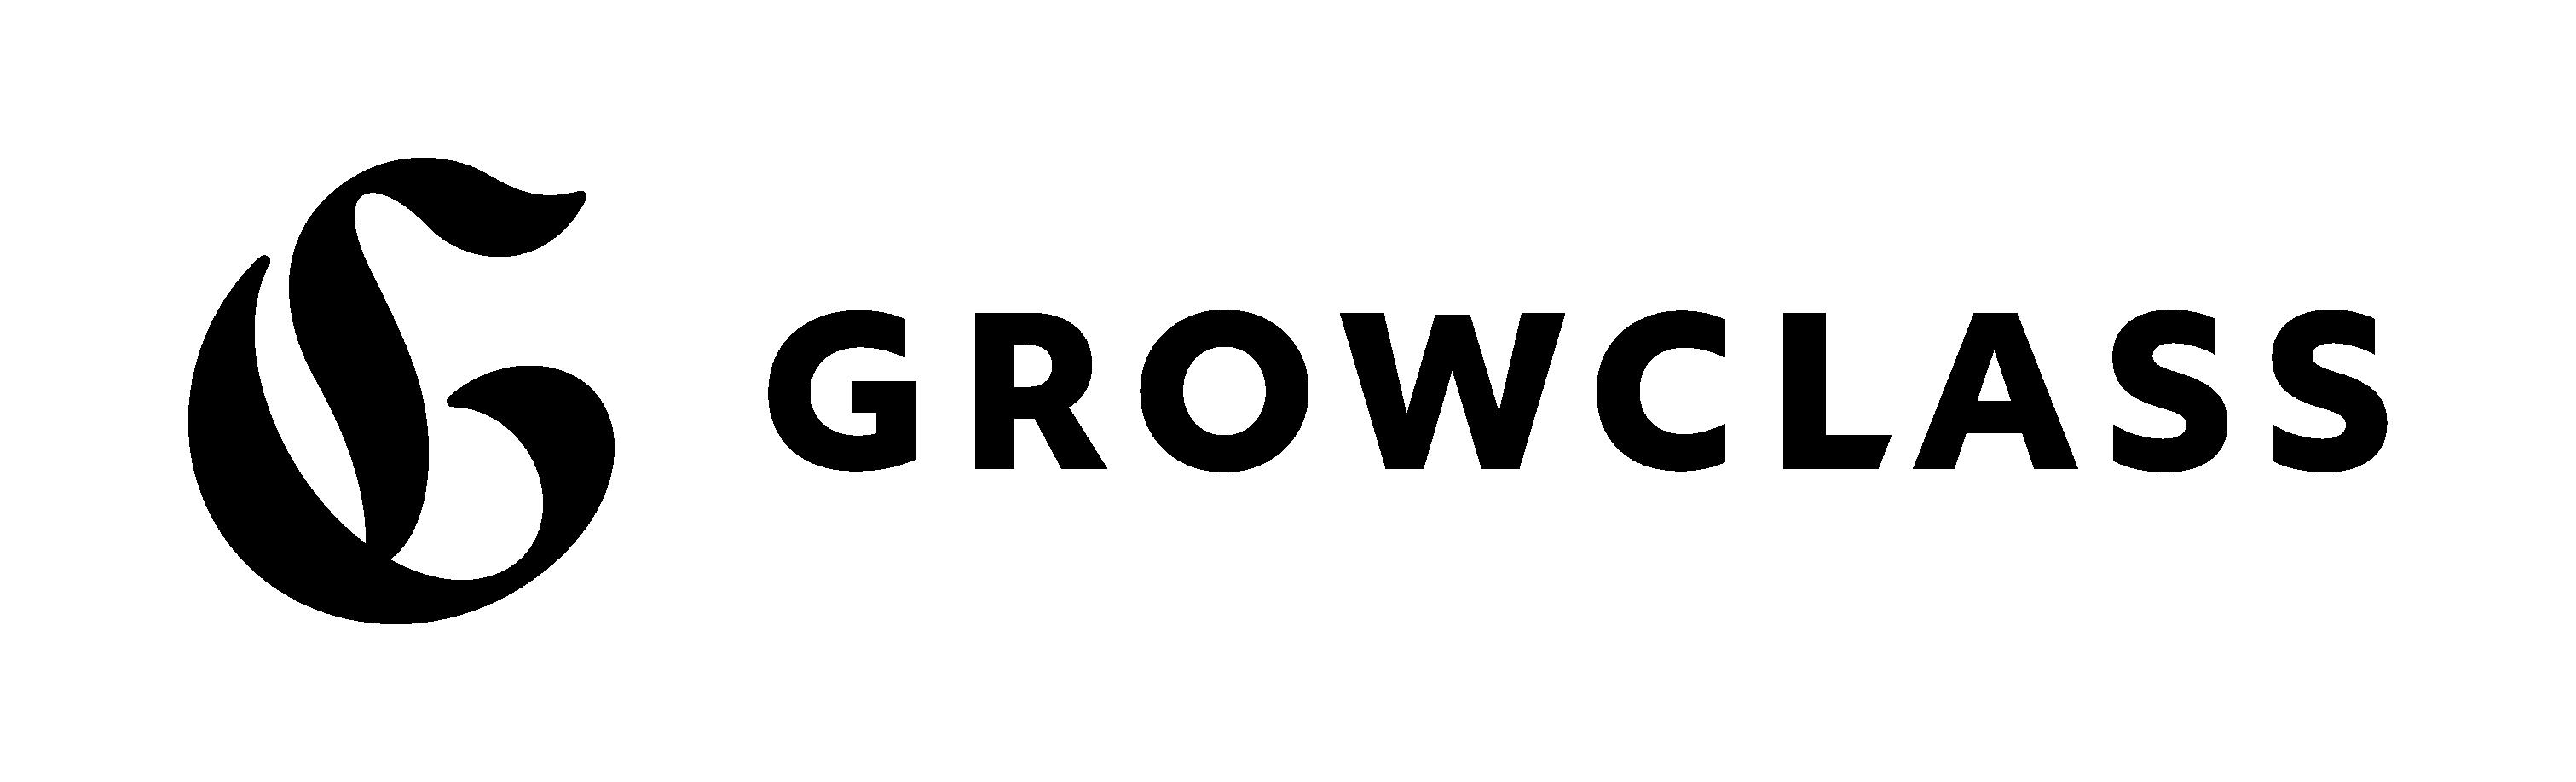 Growclass logo.